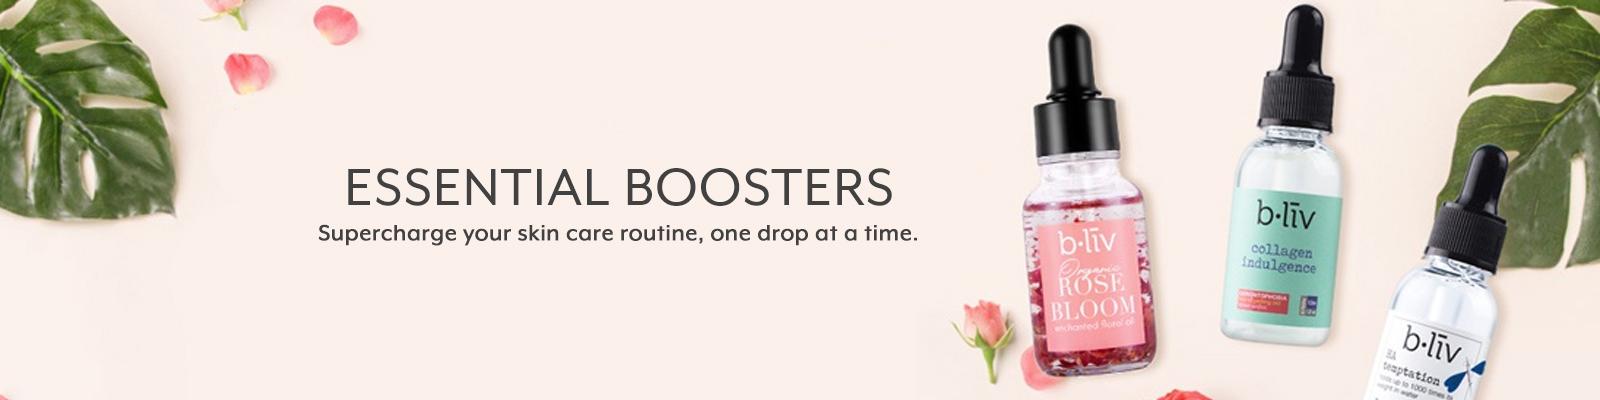 B.liv Essential Booster